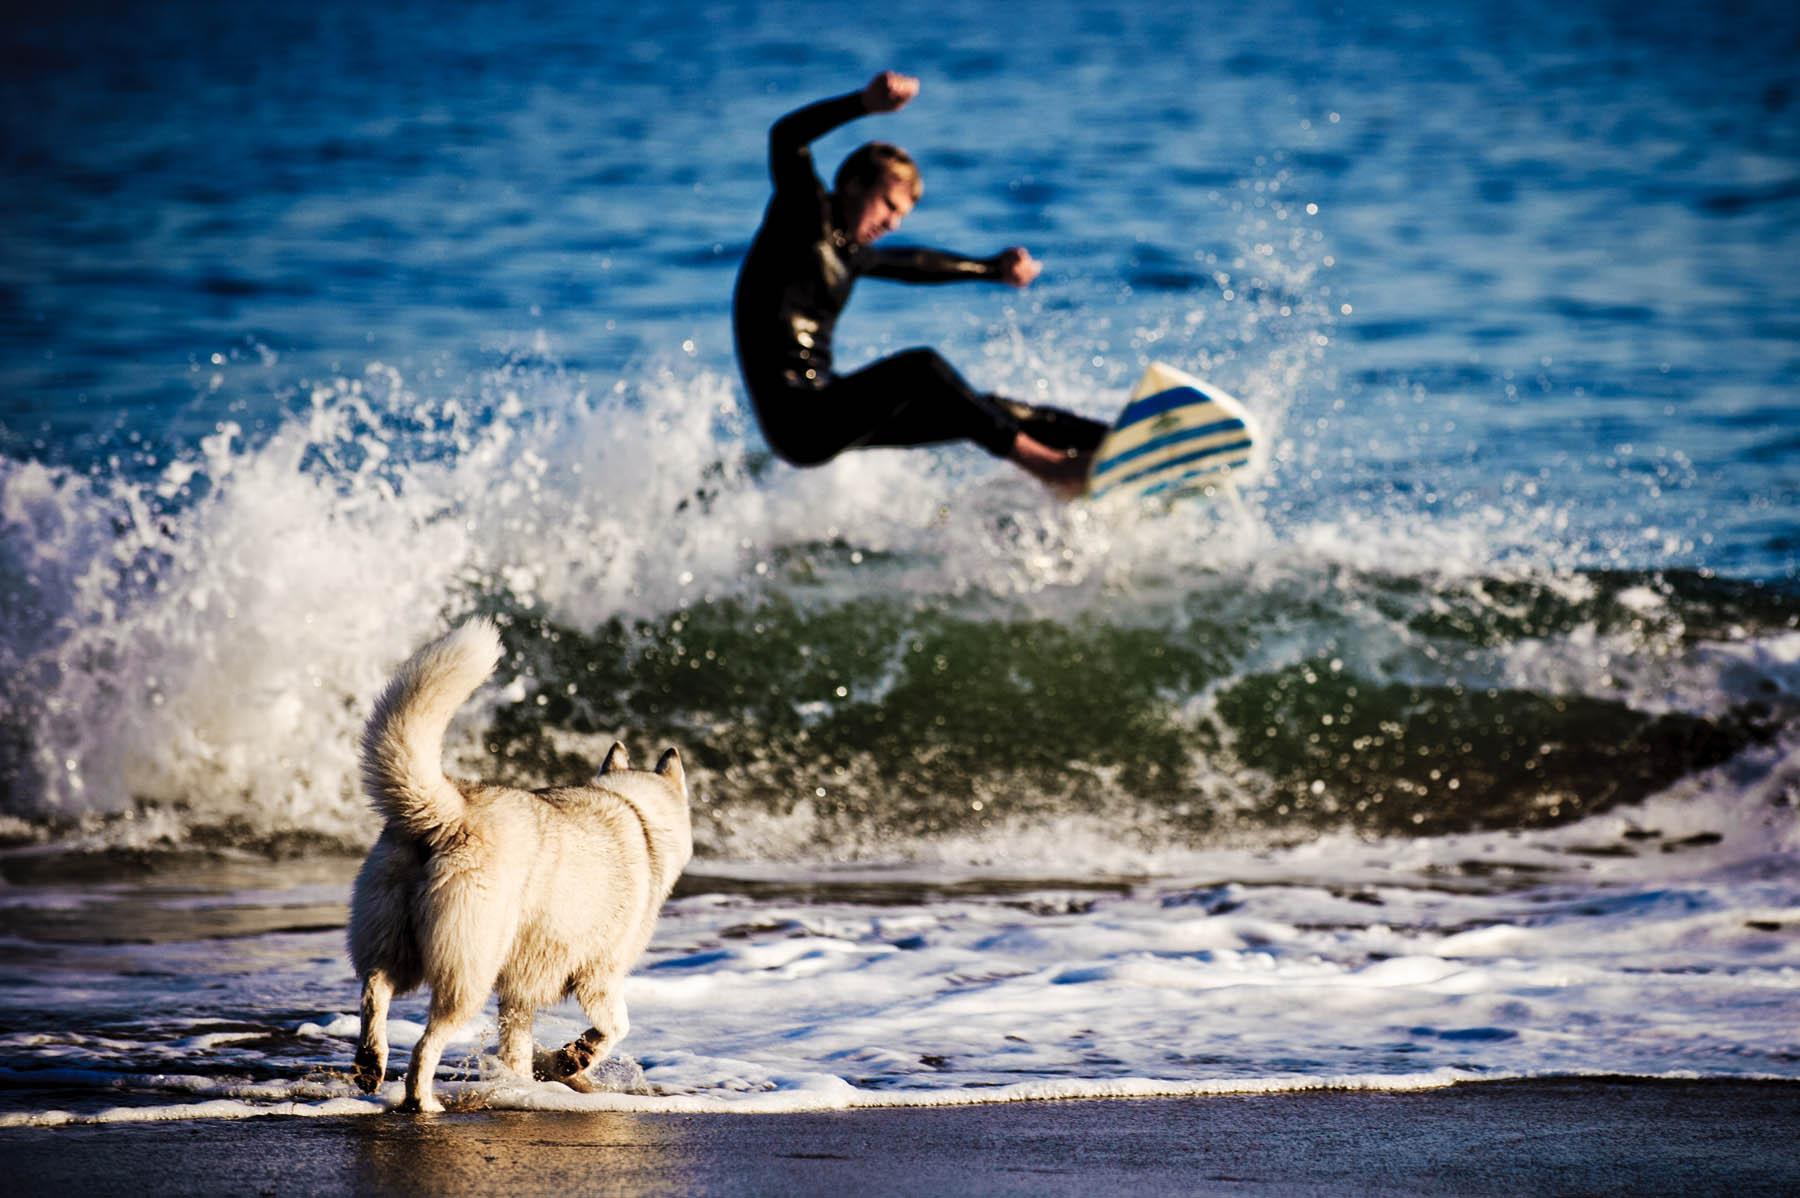 9696-d3_Alexandra_Santa_Cruz_Pet_Dogs_Photography_Lighthouse_Field_Dog_Beach.jpg